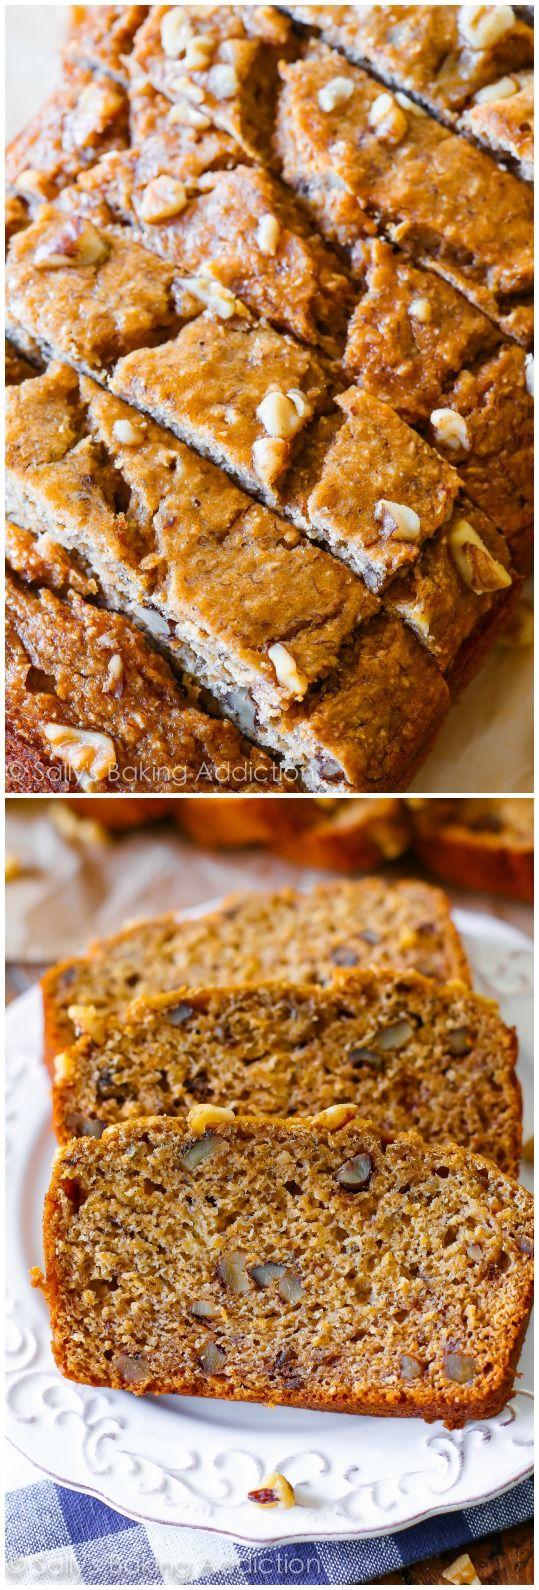 Whole Wheat Banana Bread Recipe on sallysbakingaddiction.com No oil, no butter, whole wheat, and actually tasting GREAT.